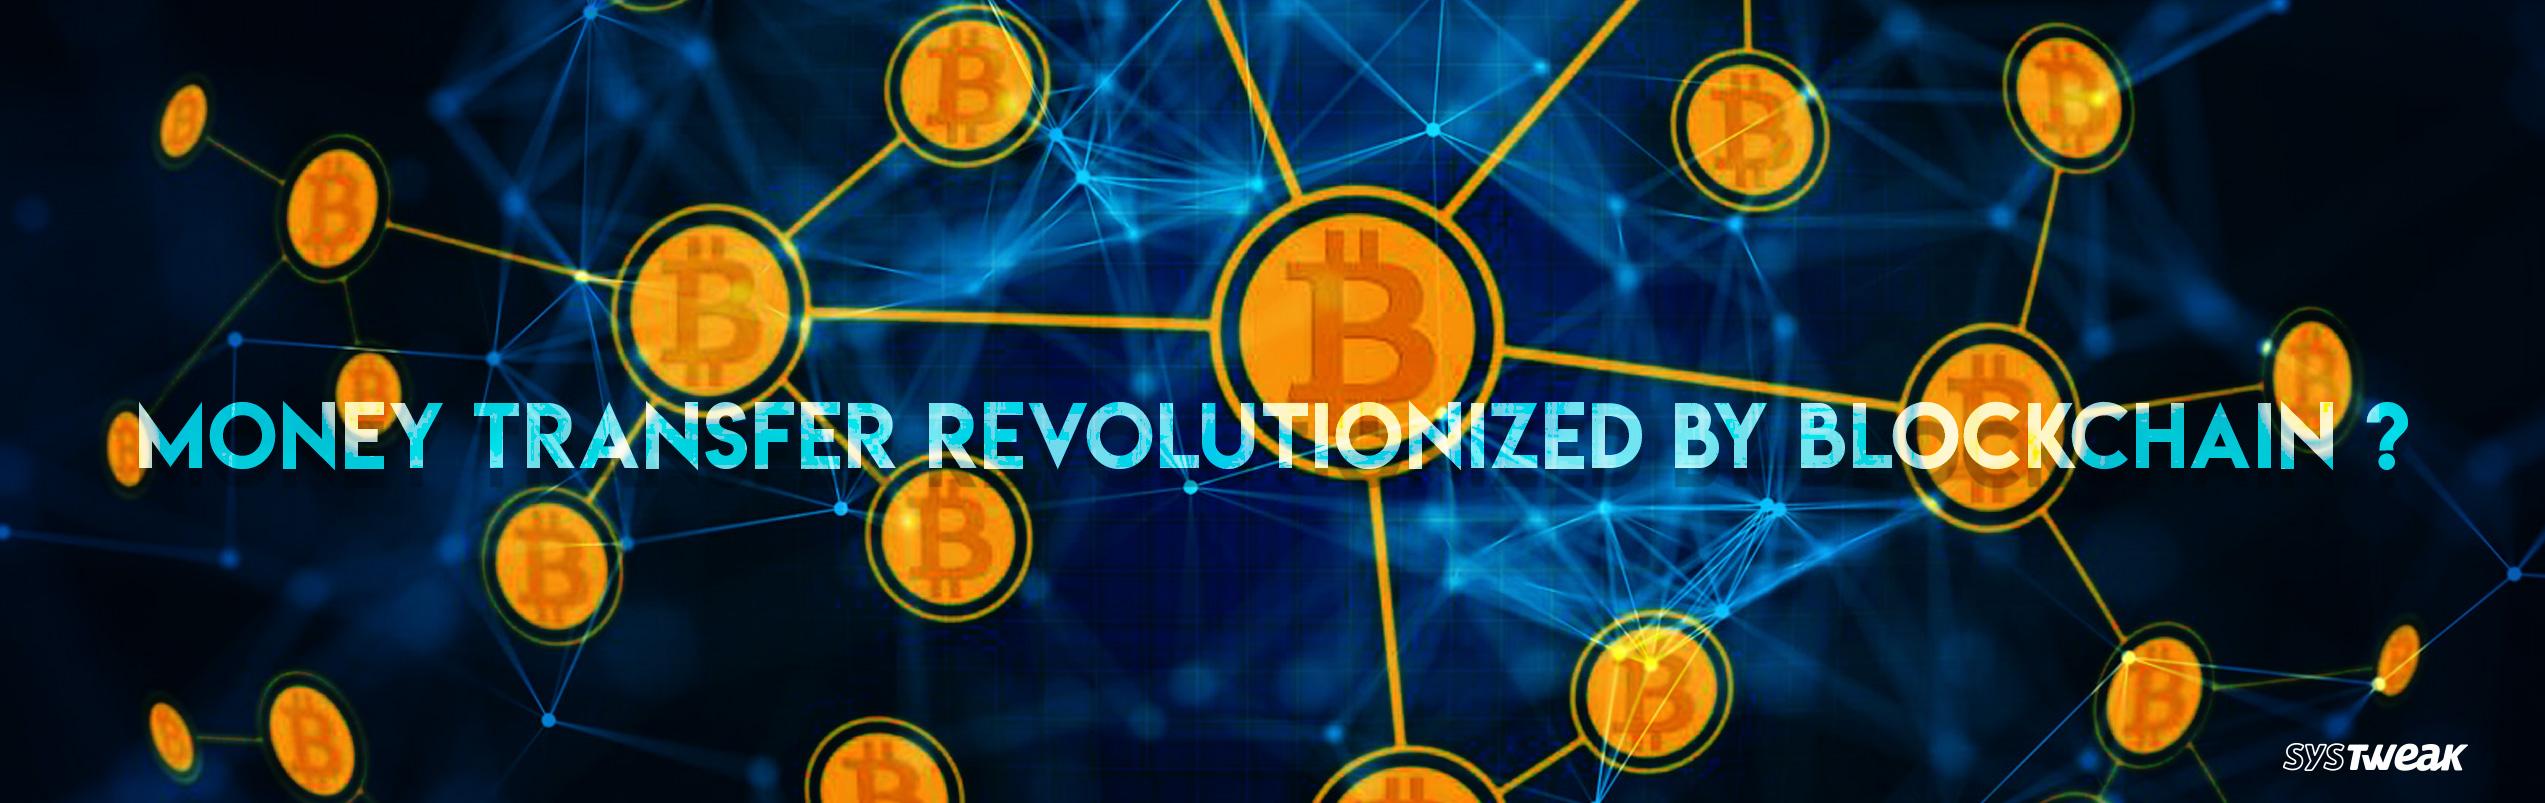 How Is Blockchain Revolutionizing Worldwide Money Transfer?